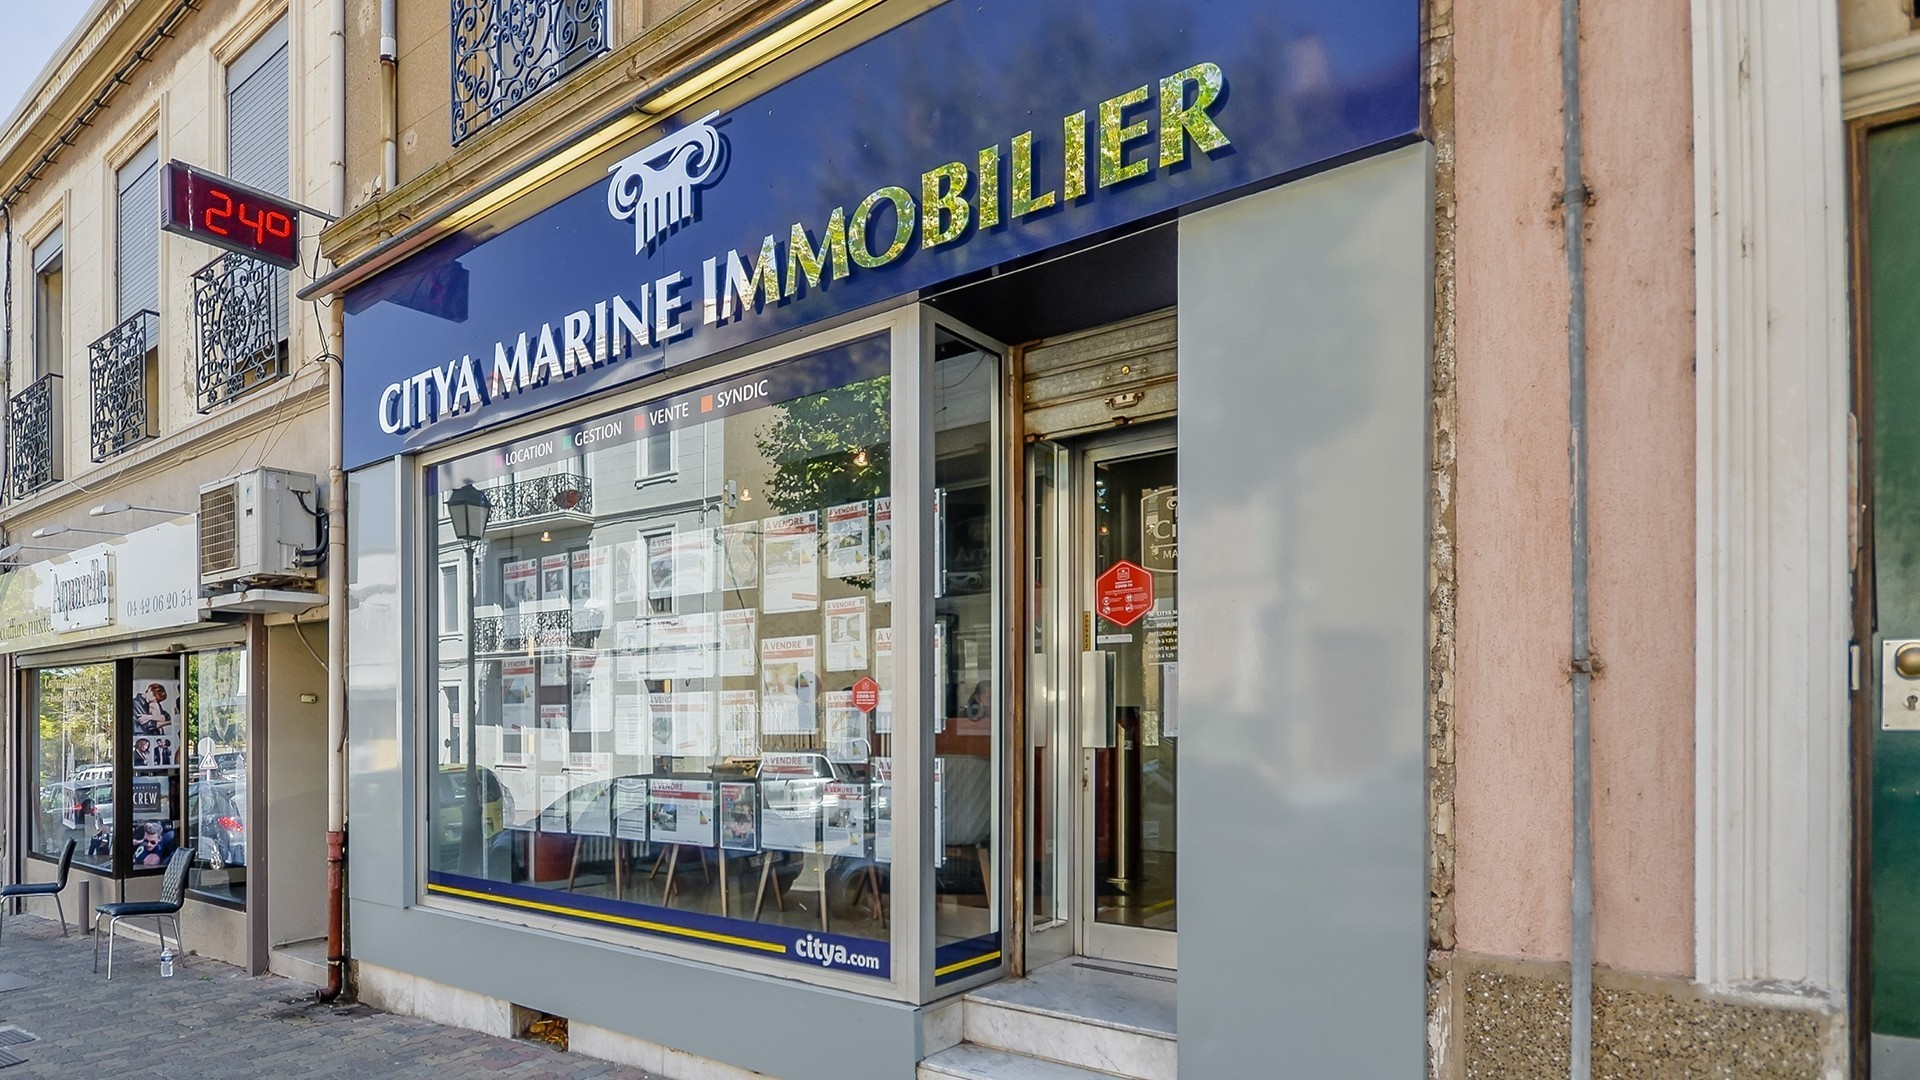 Agence immo Citya Marine Immobilier